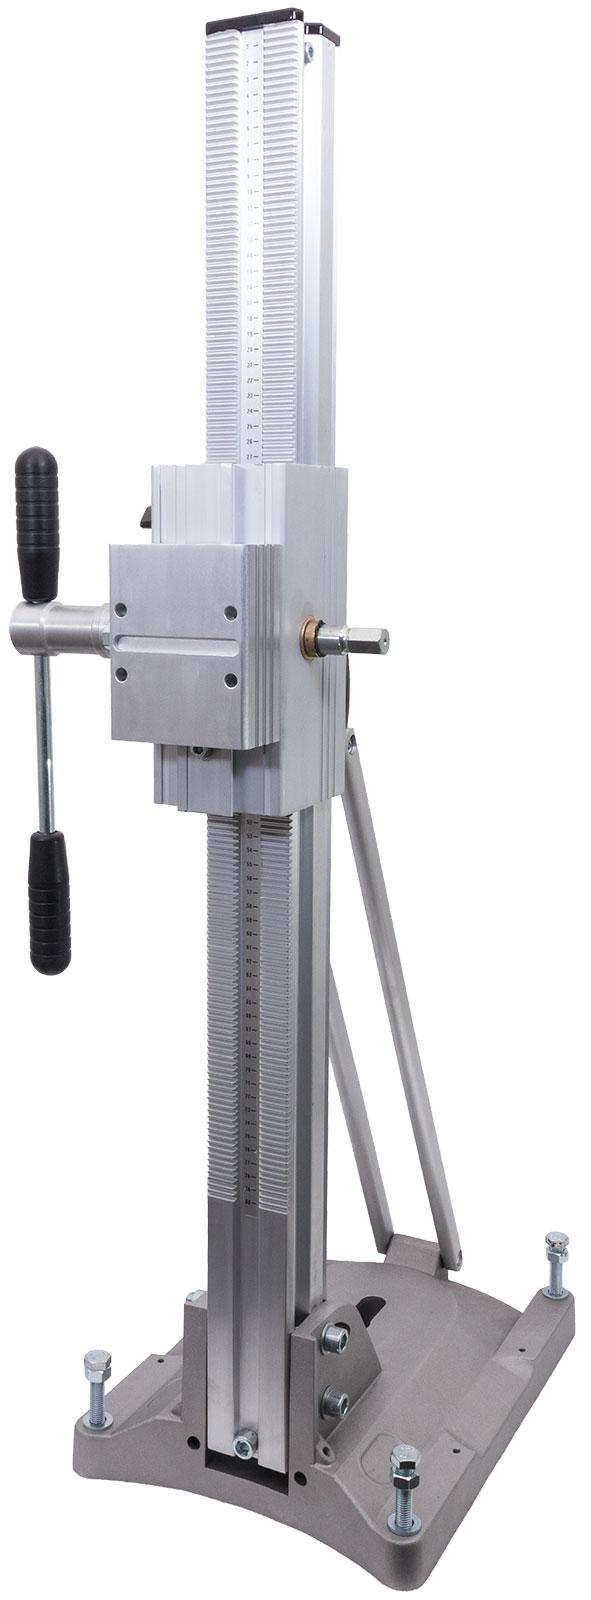 Kernbohrständer Kernbohrstativ Bohrstativ 300 mm Bohrkronen Alu Leichtbau Vakuum Kombi Fuß